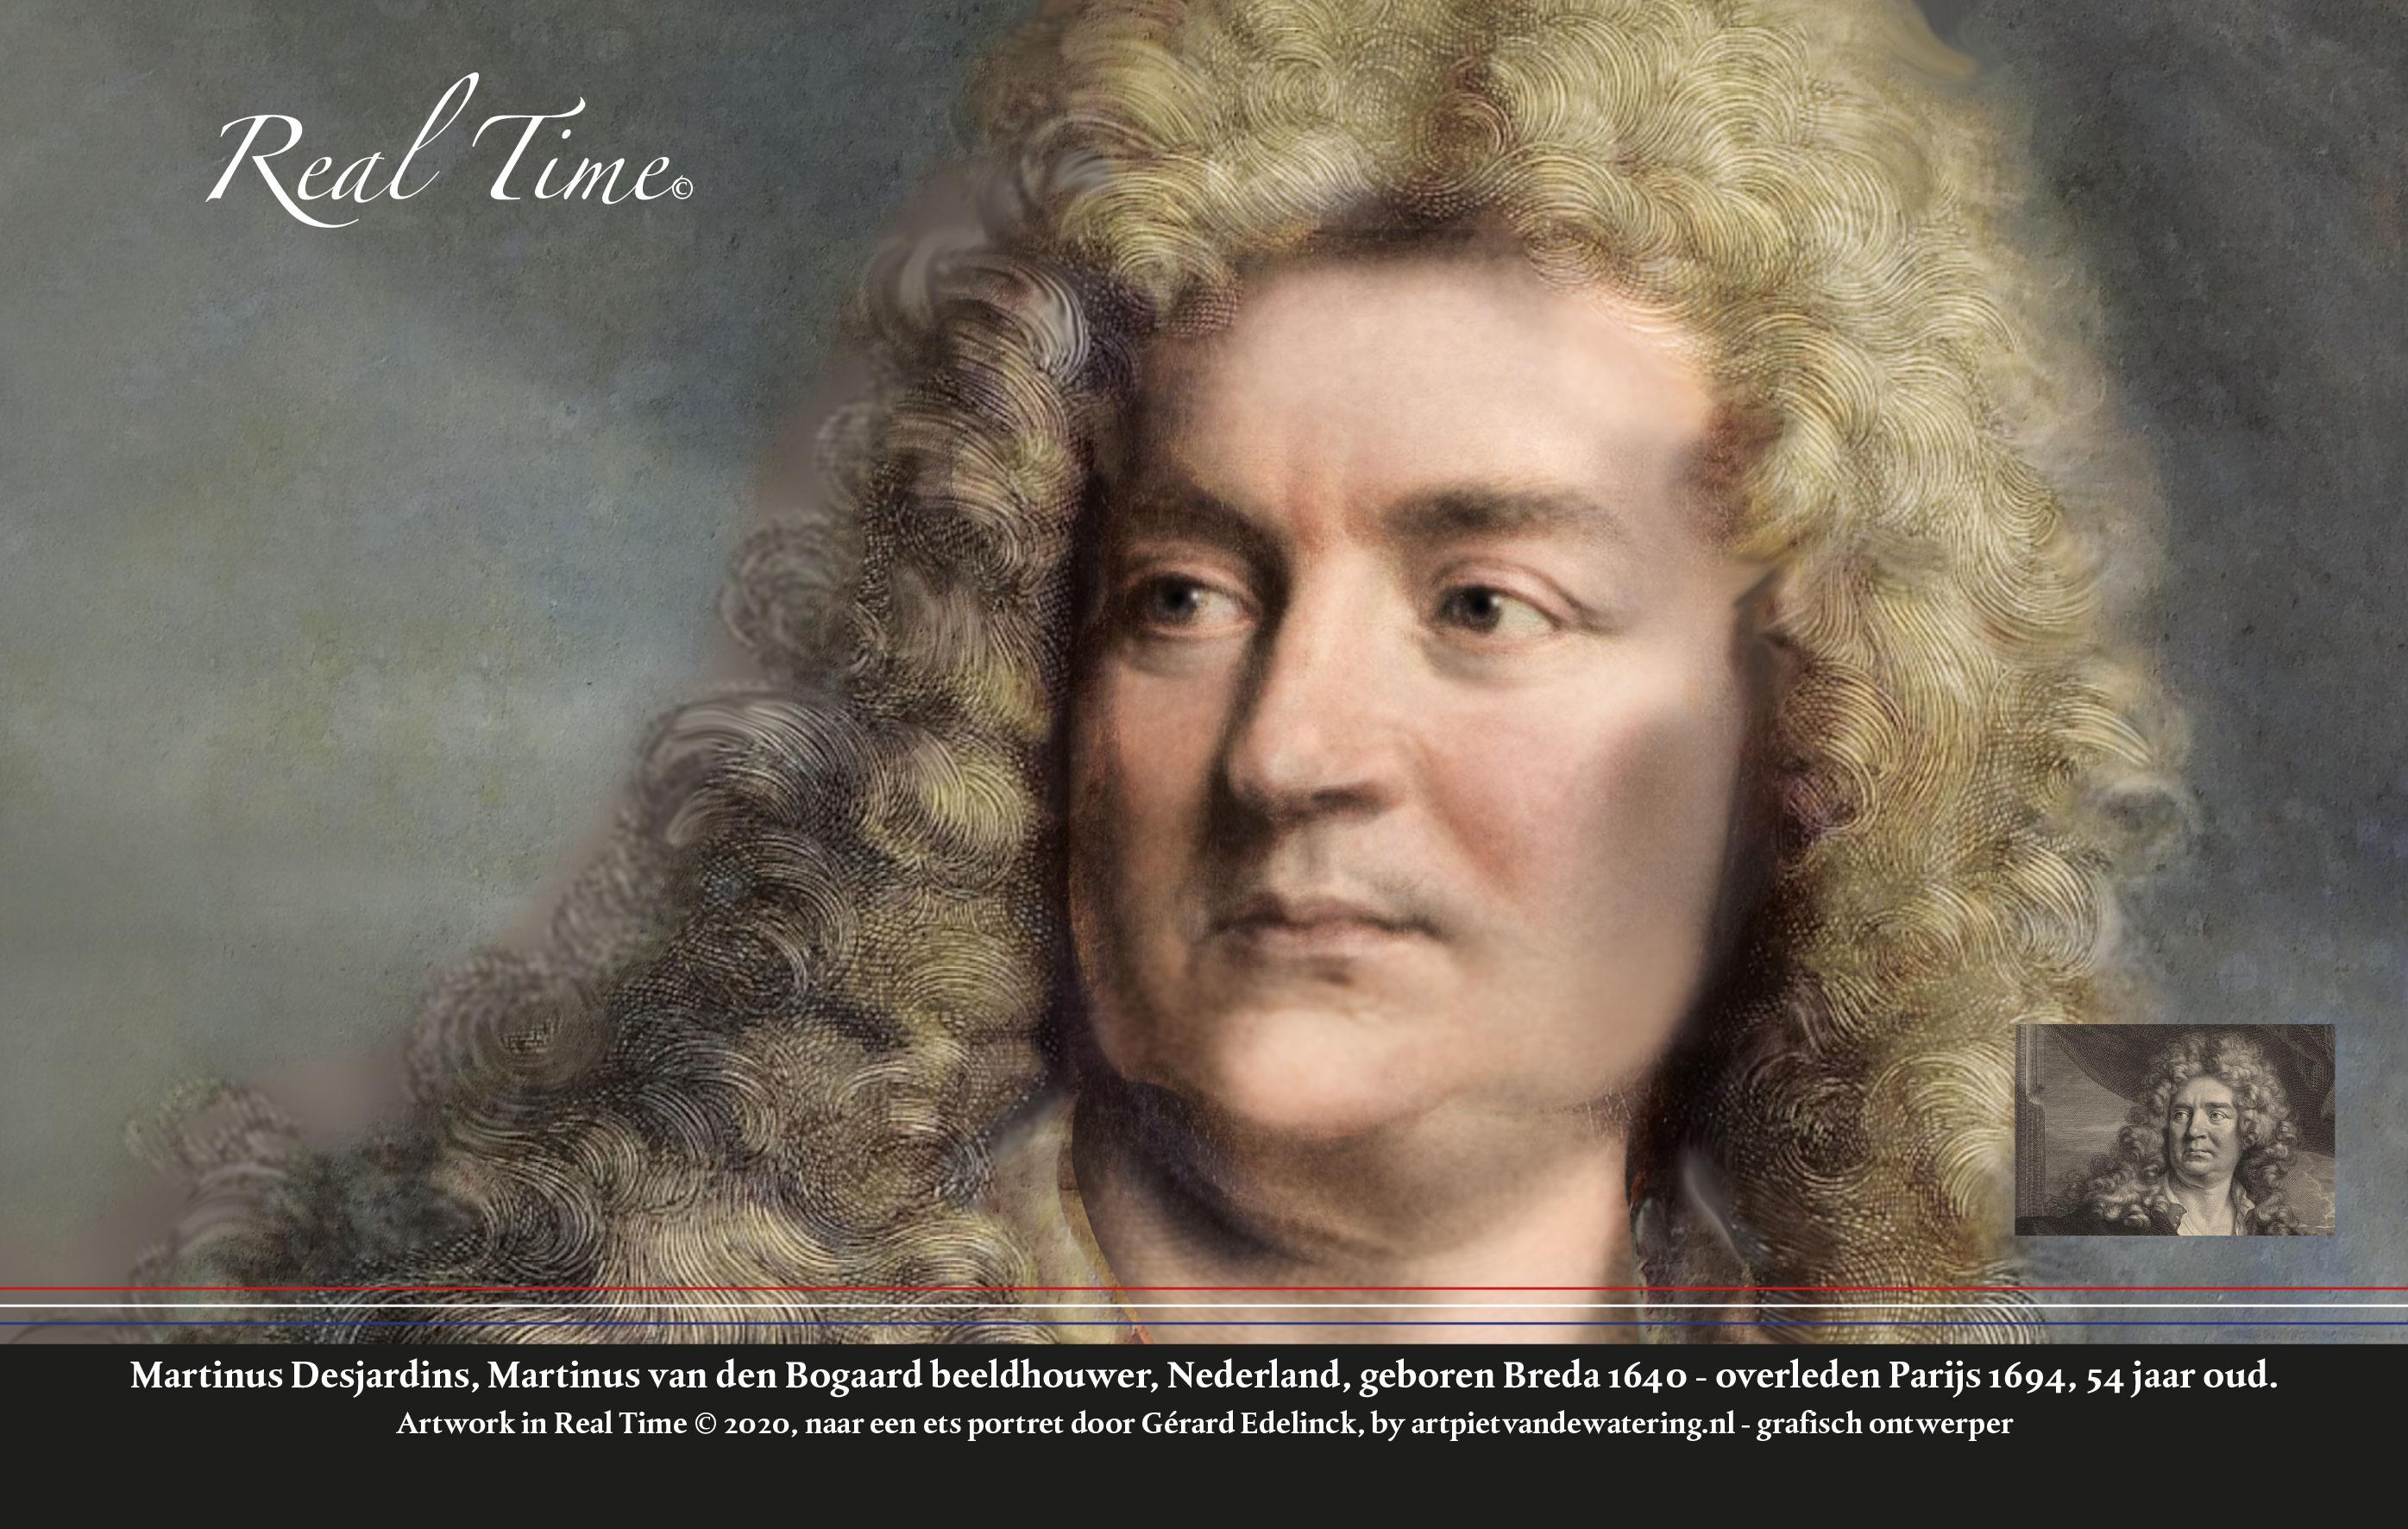 Martinus-Desjardins-1640-1694